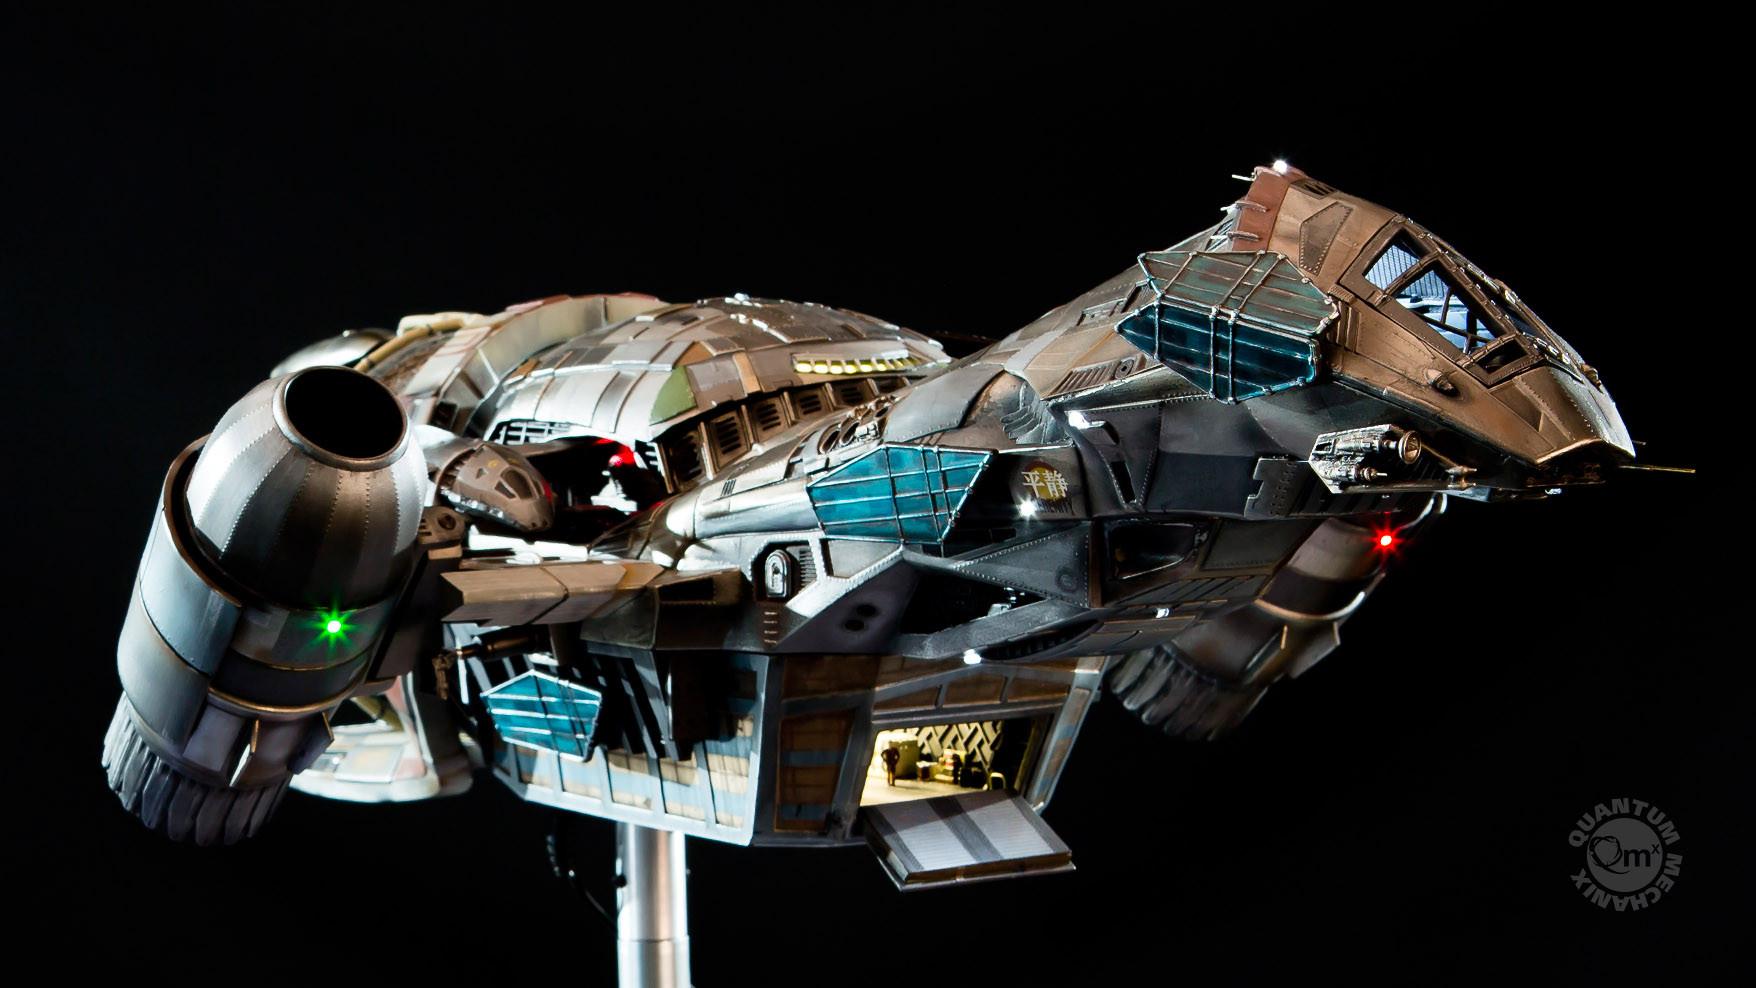 astonishing-replica-model-of-serenity-from-firefly